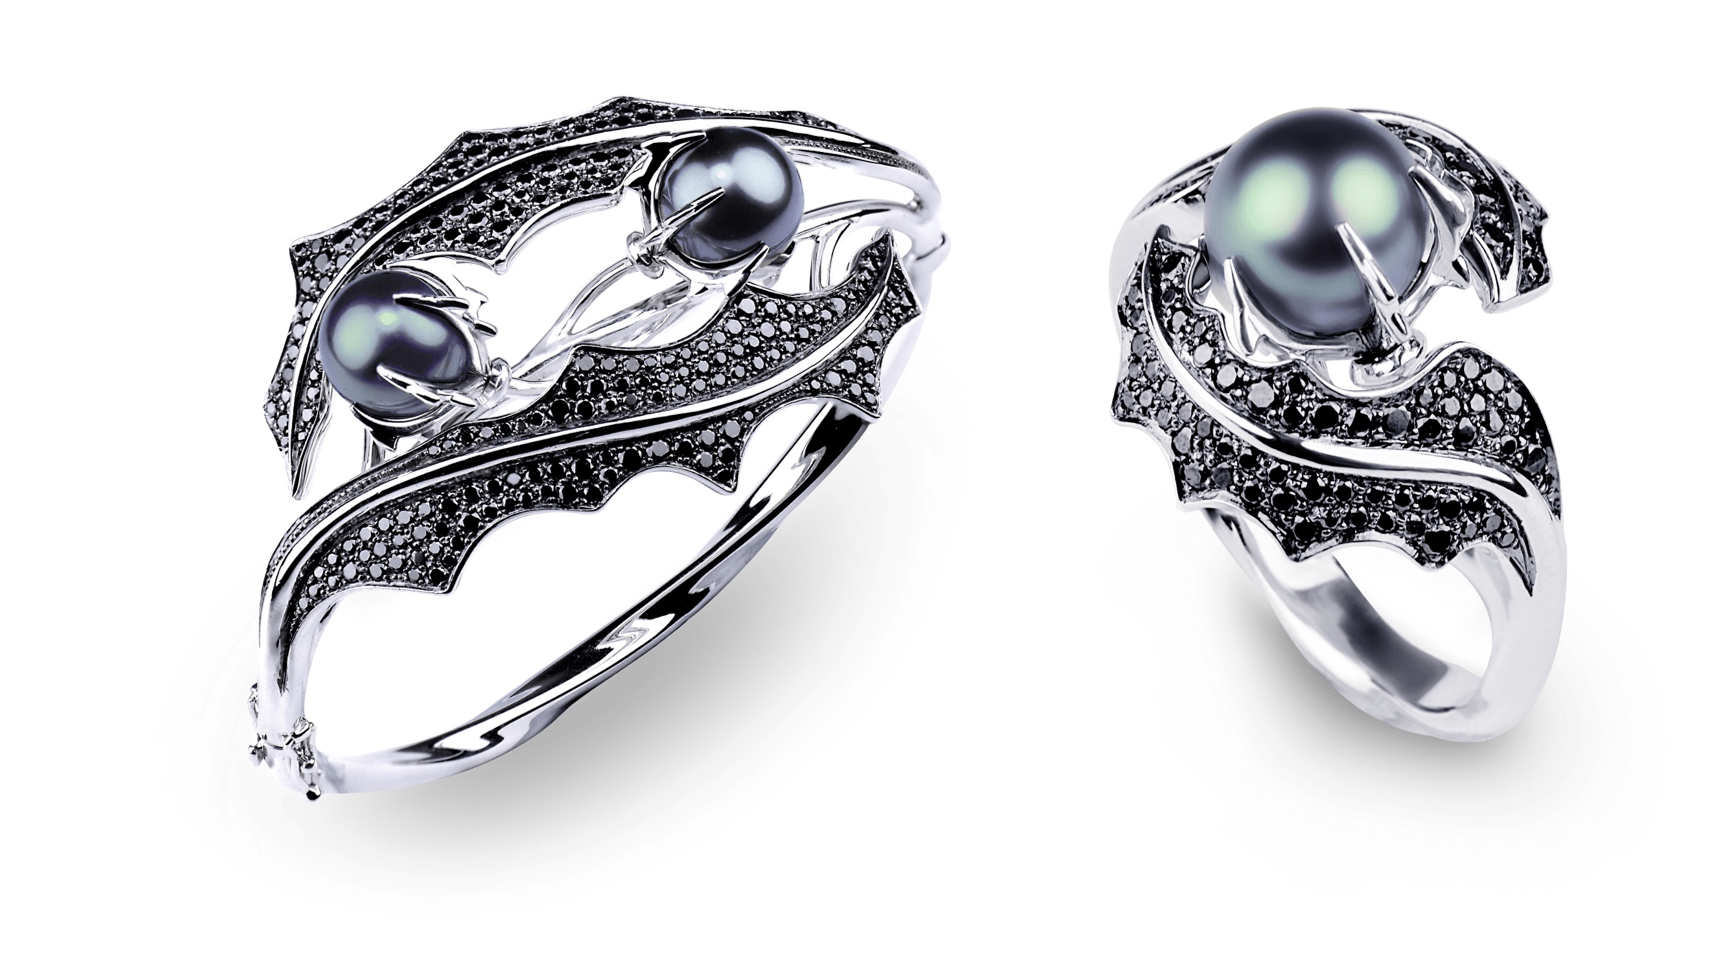 Jewellery -Bespoke Shaun Leane